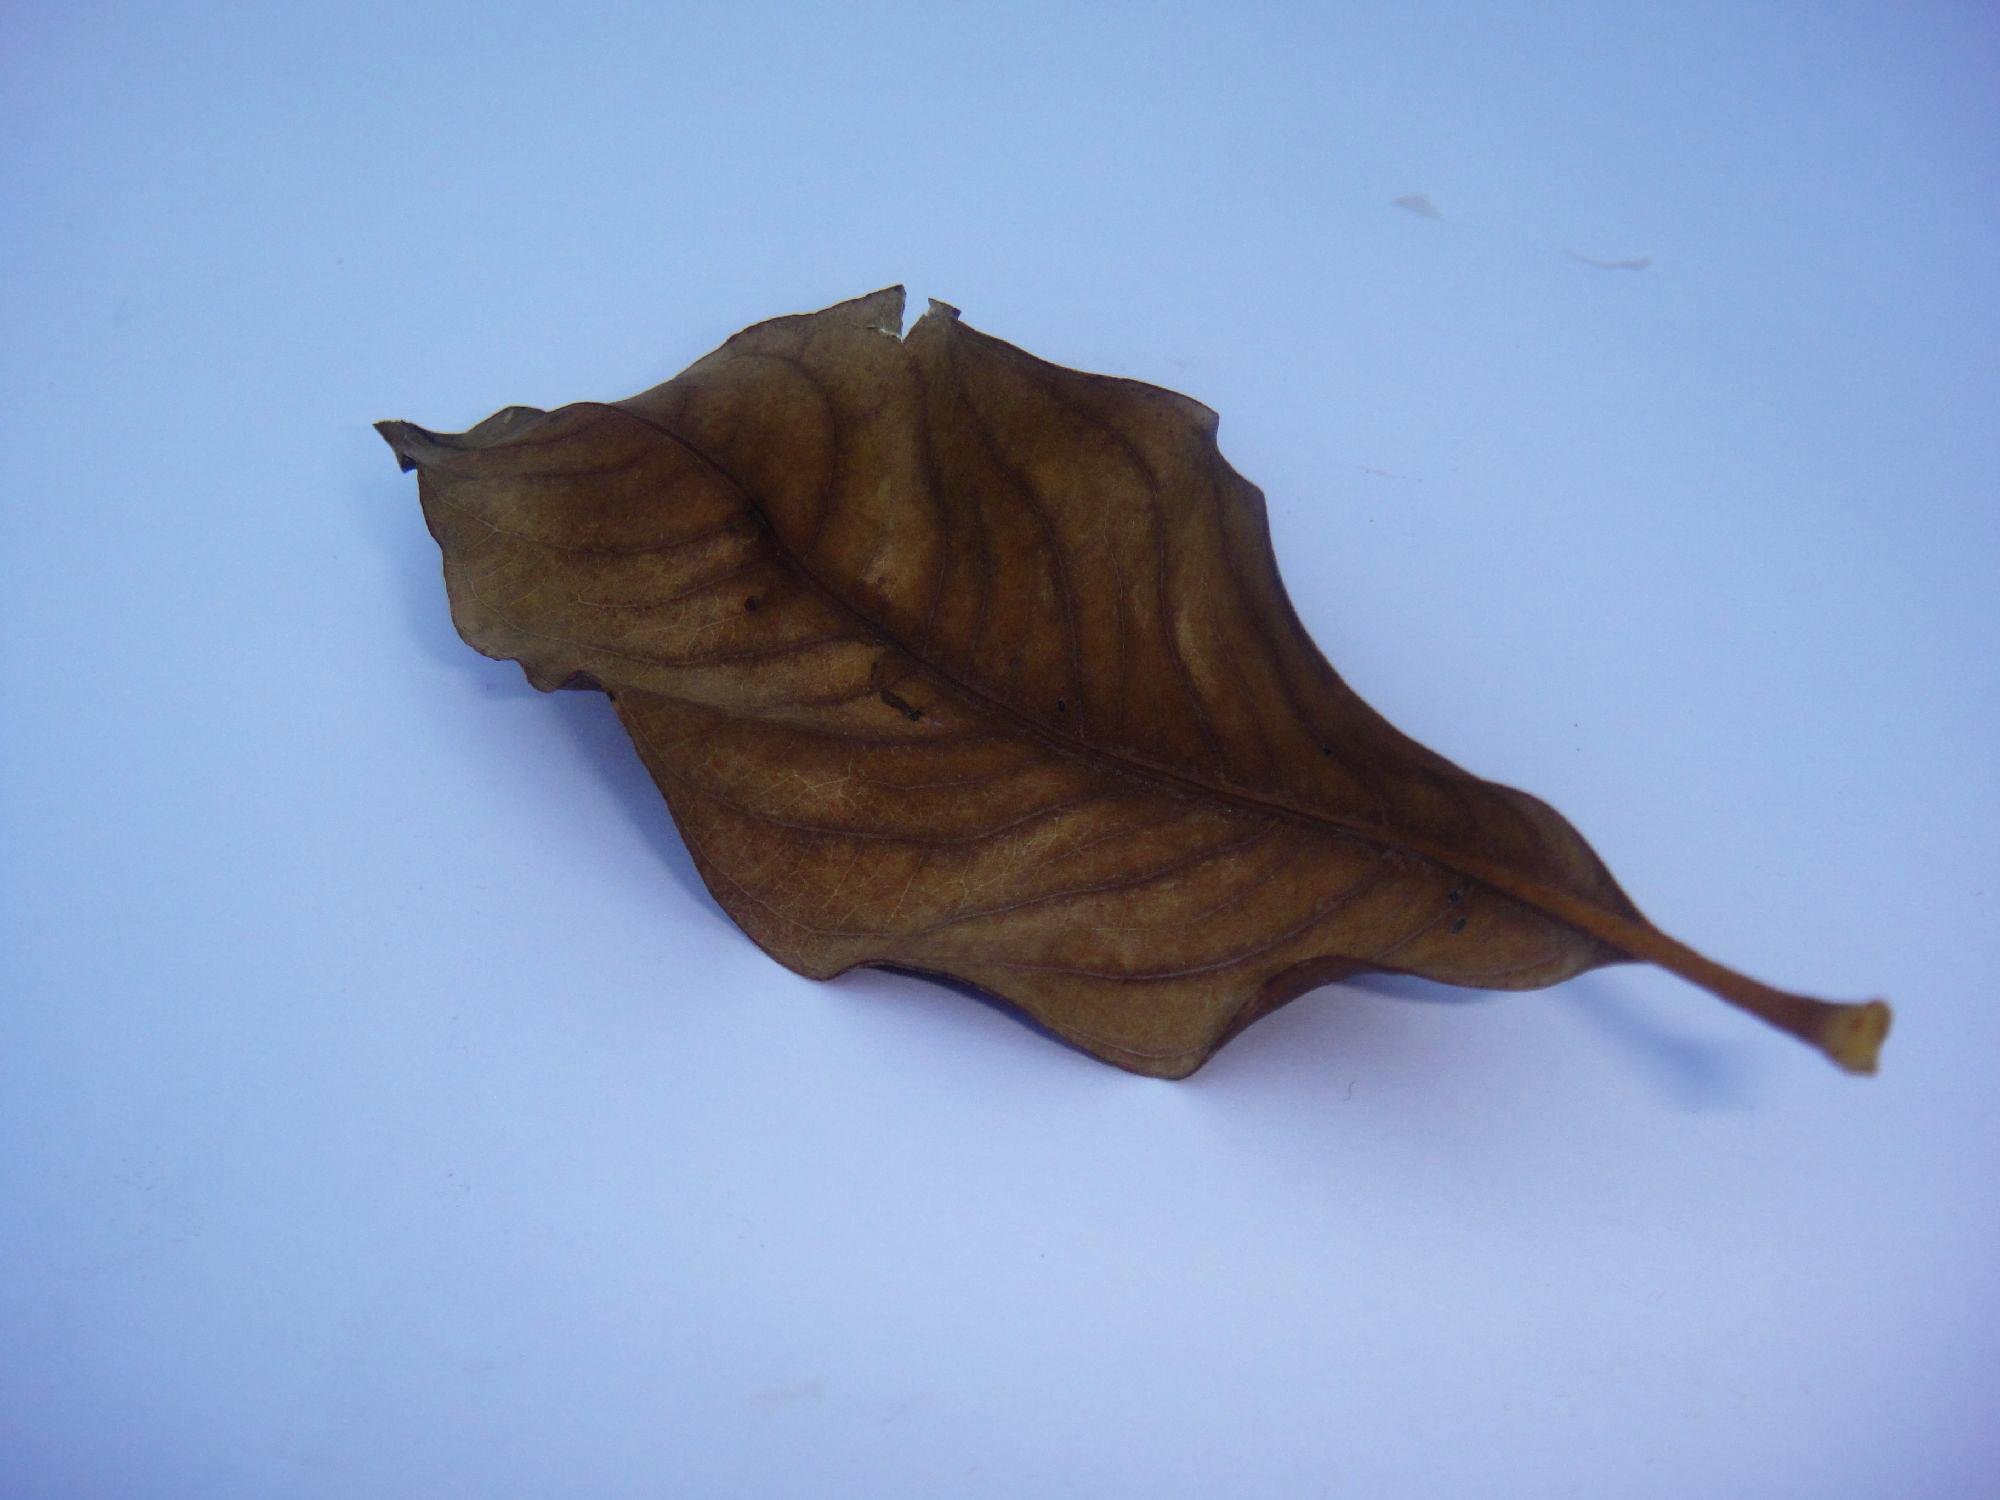 Dry leaf photo